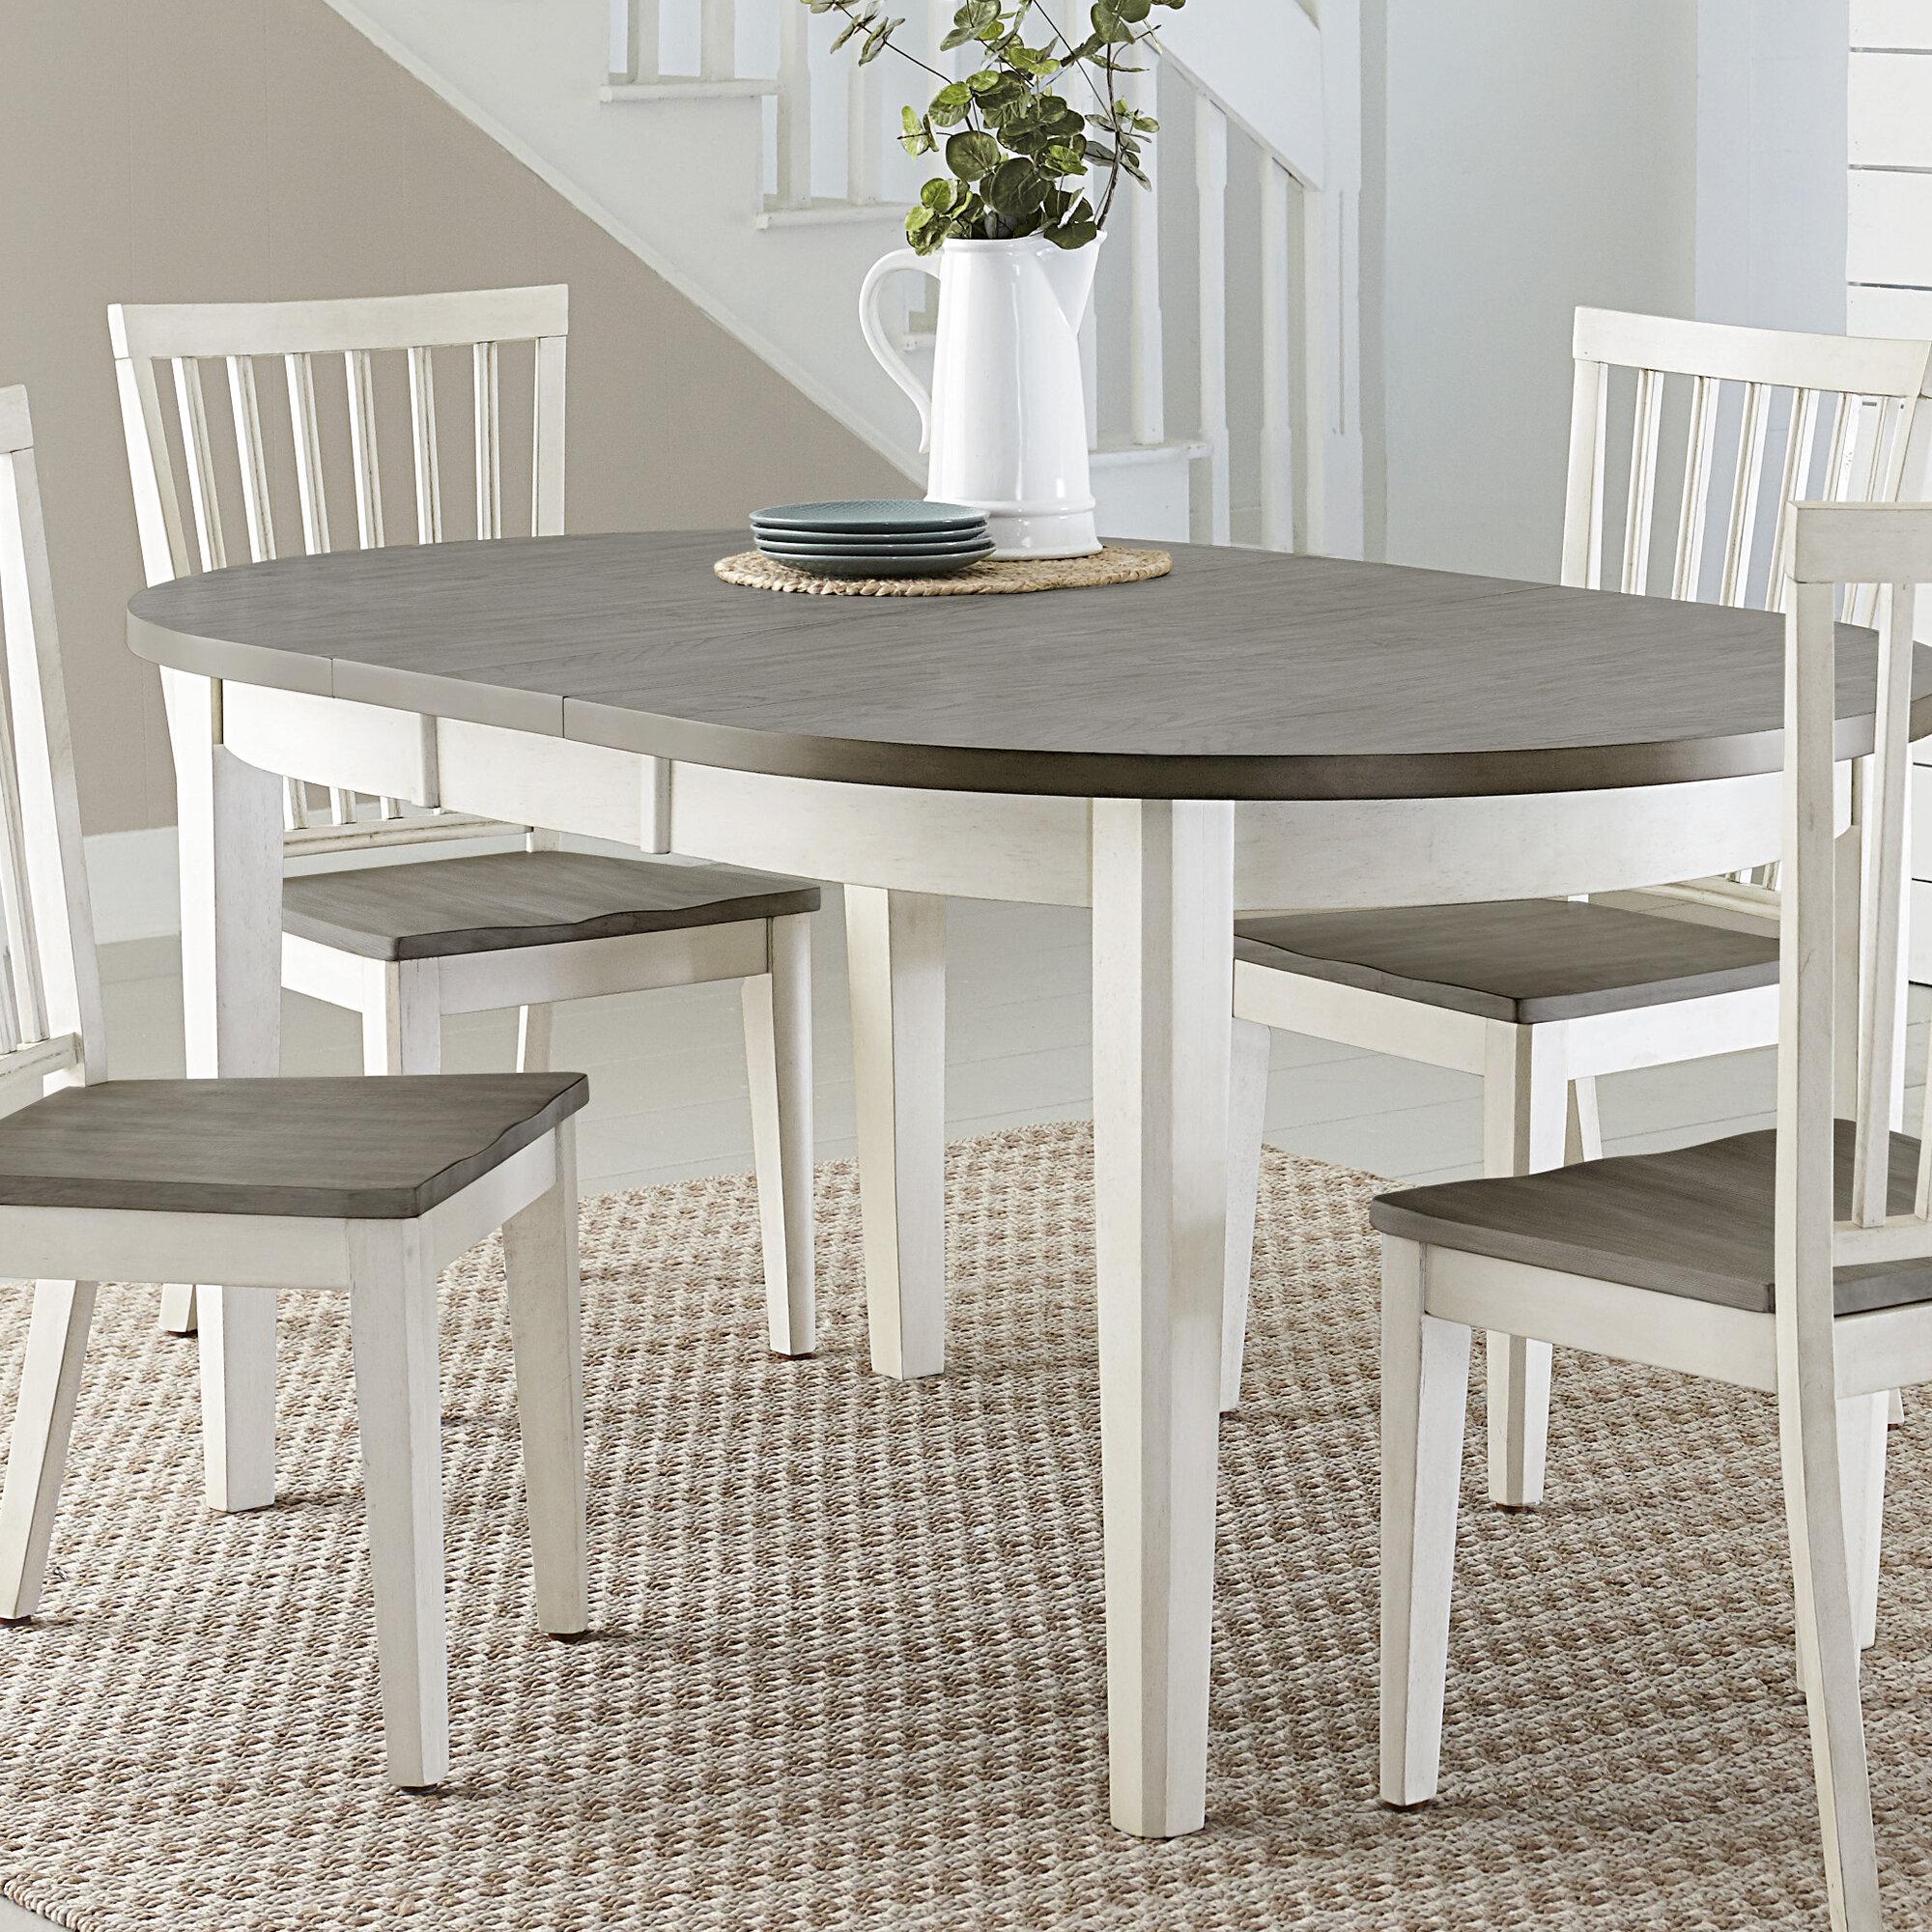 August Grove Coronado Extendable Dining Table